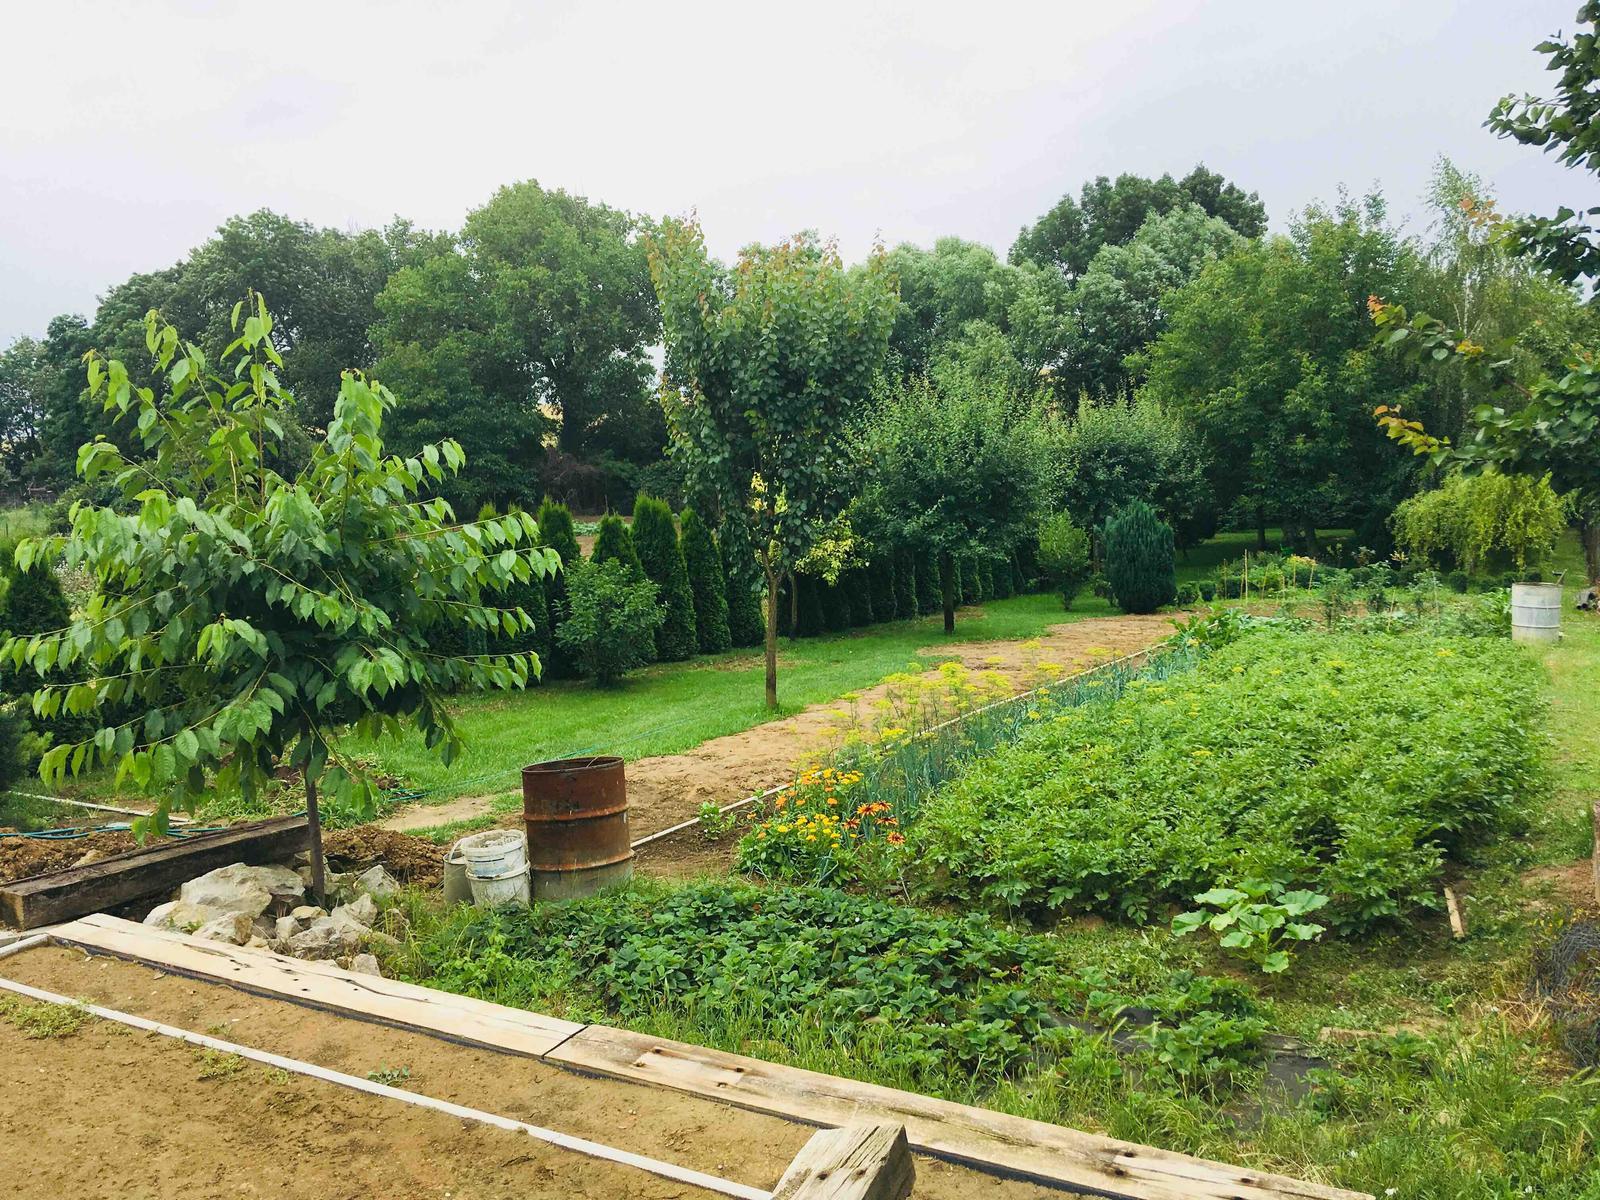 Názov stavby 3 - in da garden - moja posilka a psychoterapia